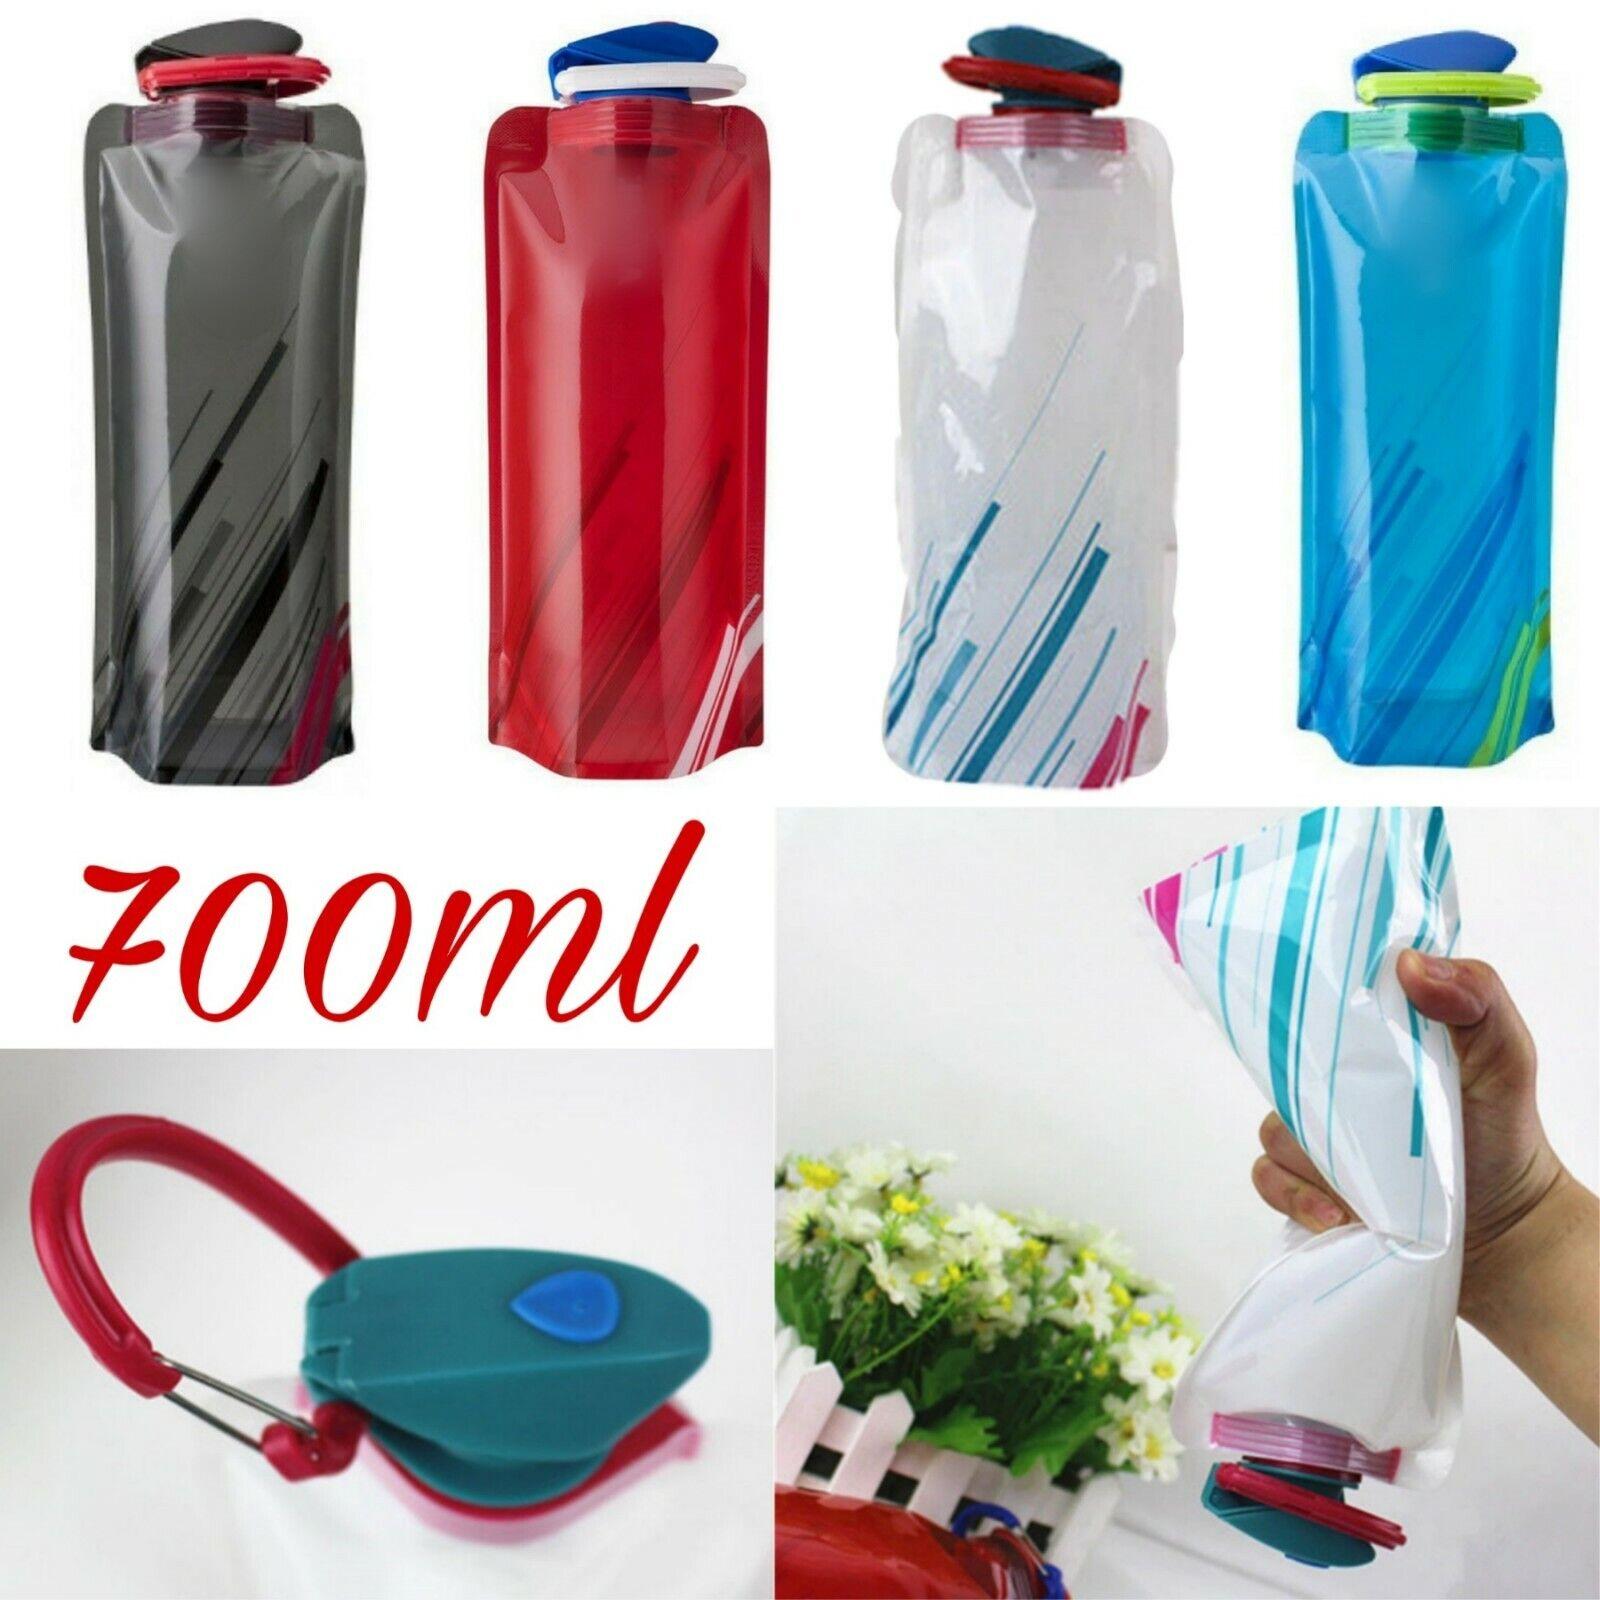 1 - 5x 700ml Trinkflasche Faltbar Festival Sommer Beutel Wasser Flasche Camping